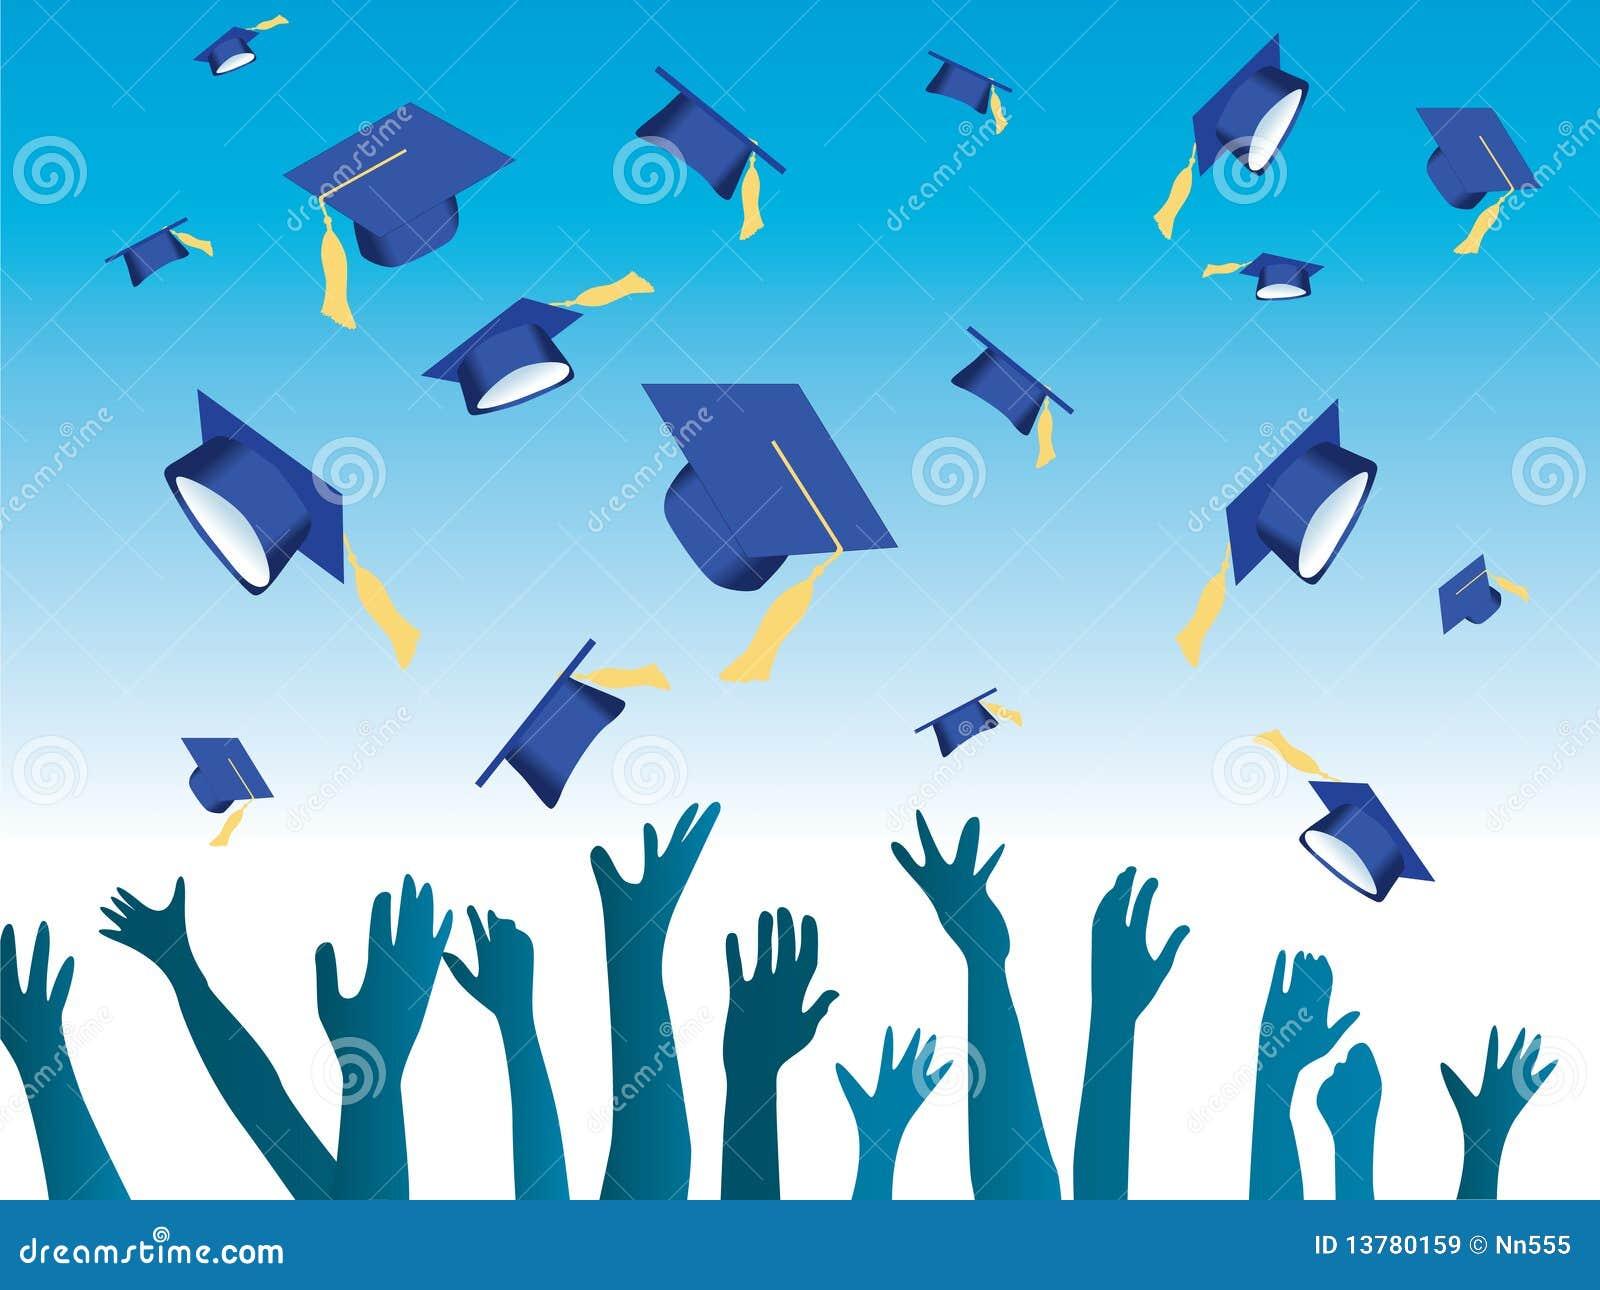 Throwing Graduation Caps Vector